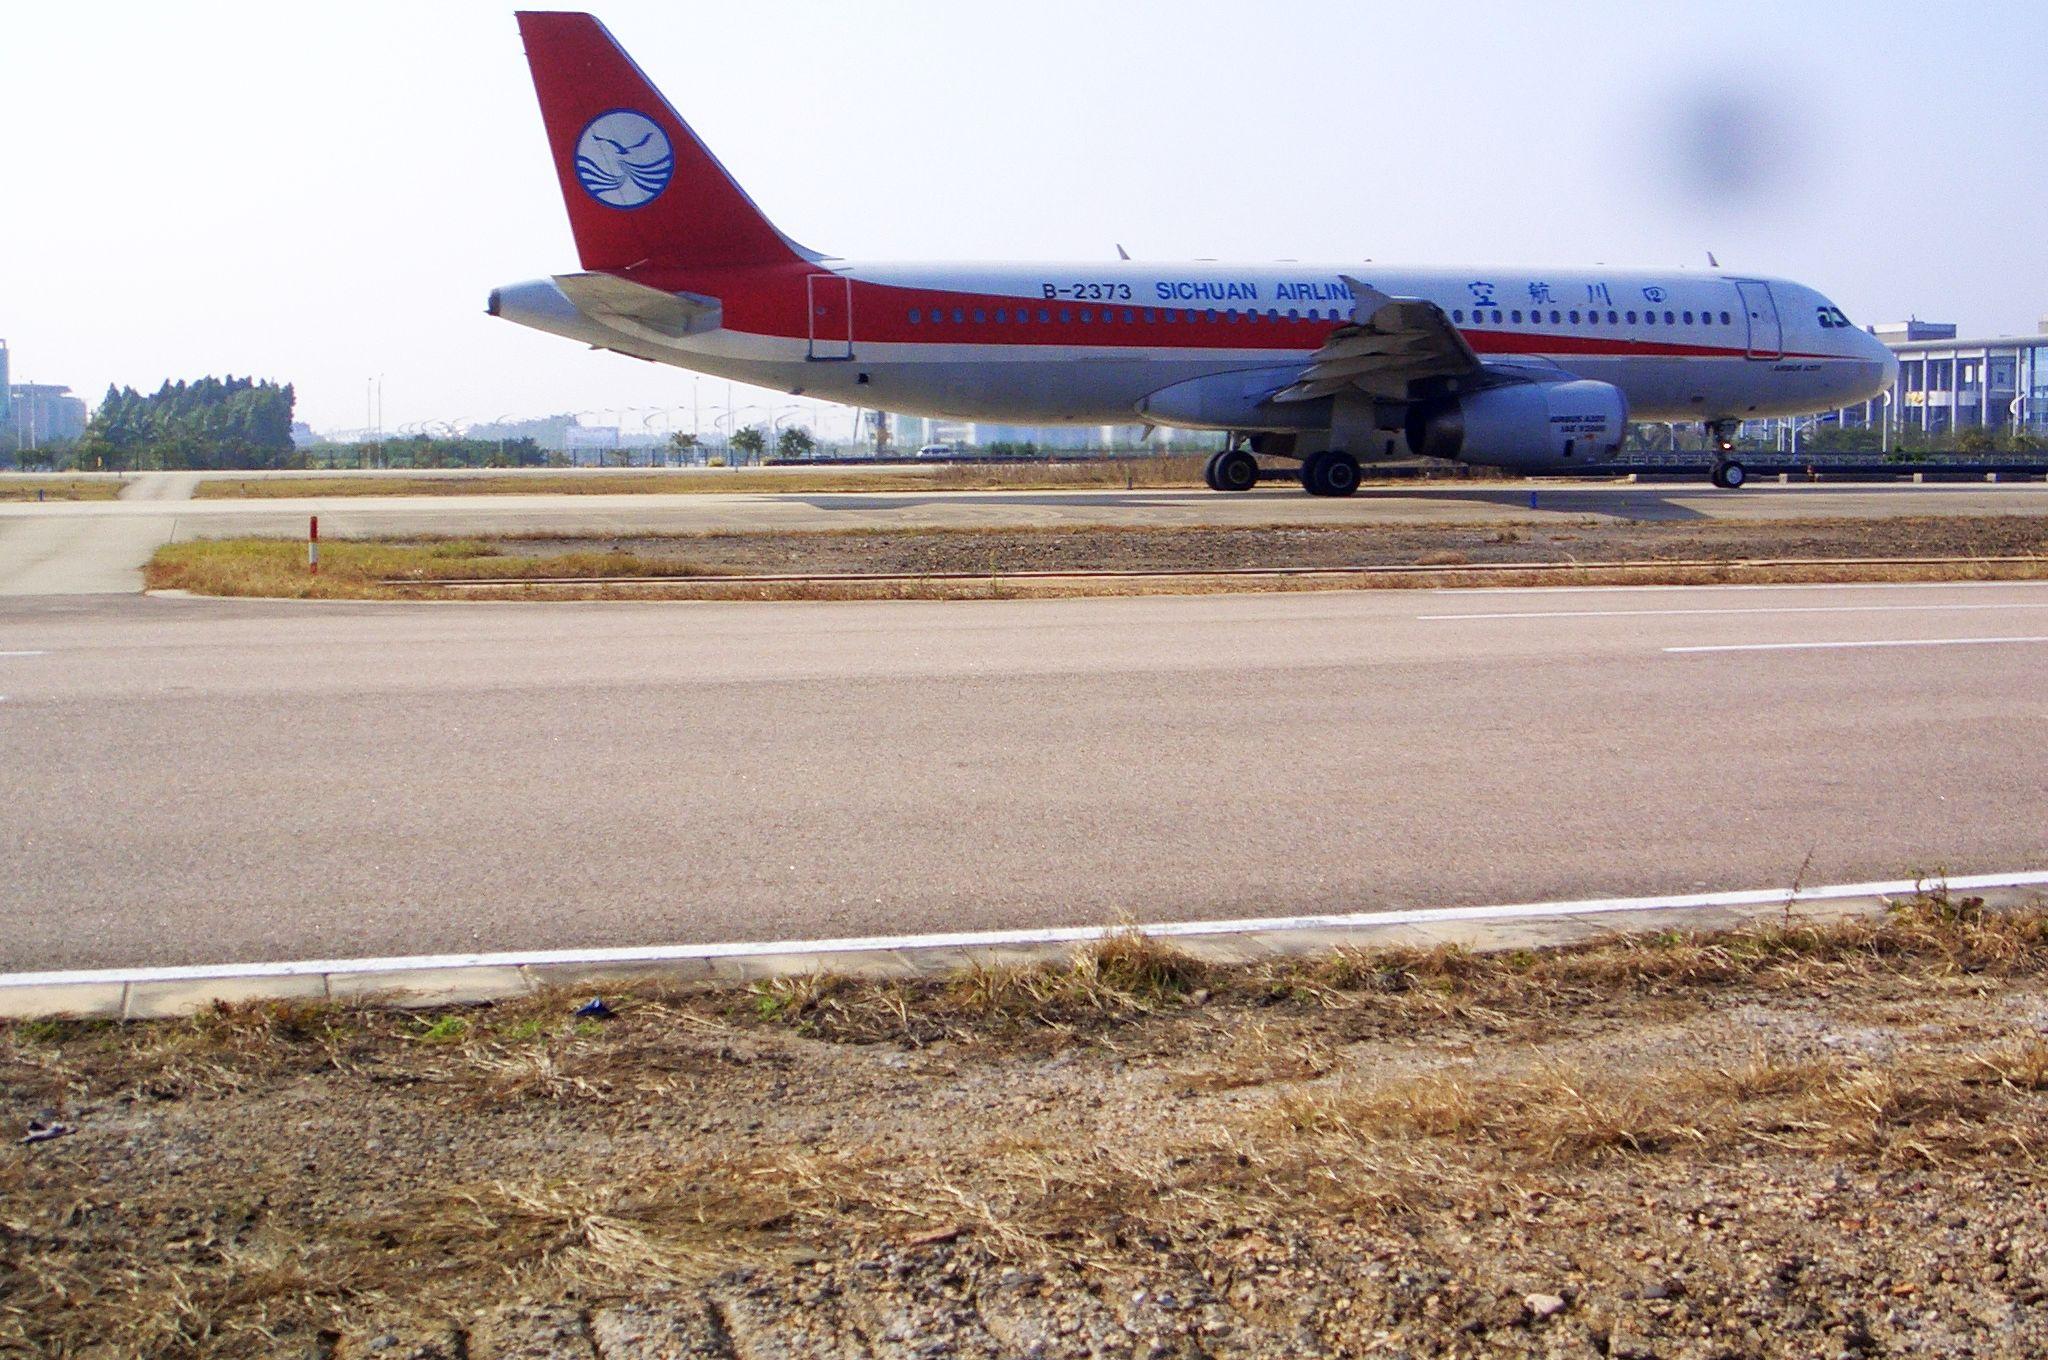 Re:[原创]恢复信心后的第一次发帖,09年第一次活动 AIRBUS A320-200 B-2373 广州白云国际机场